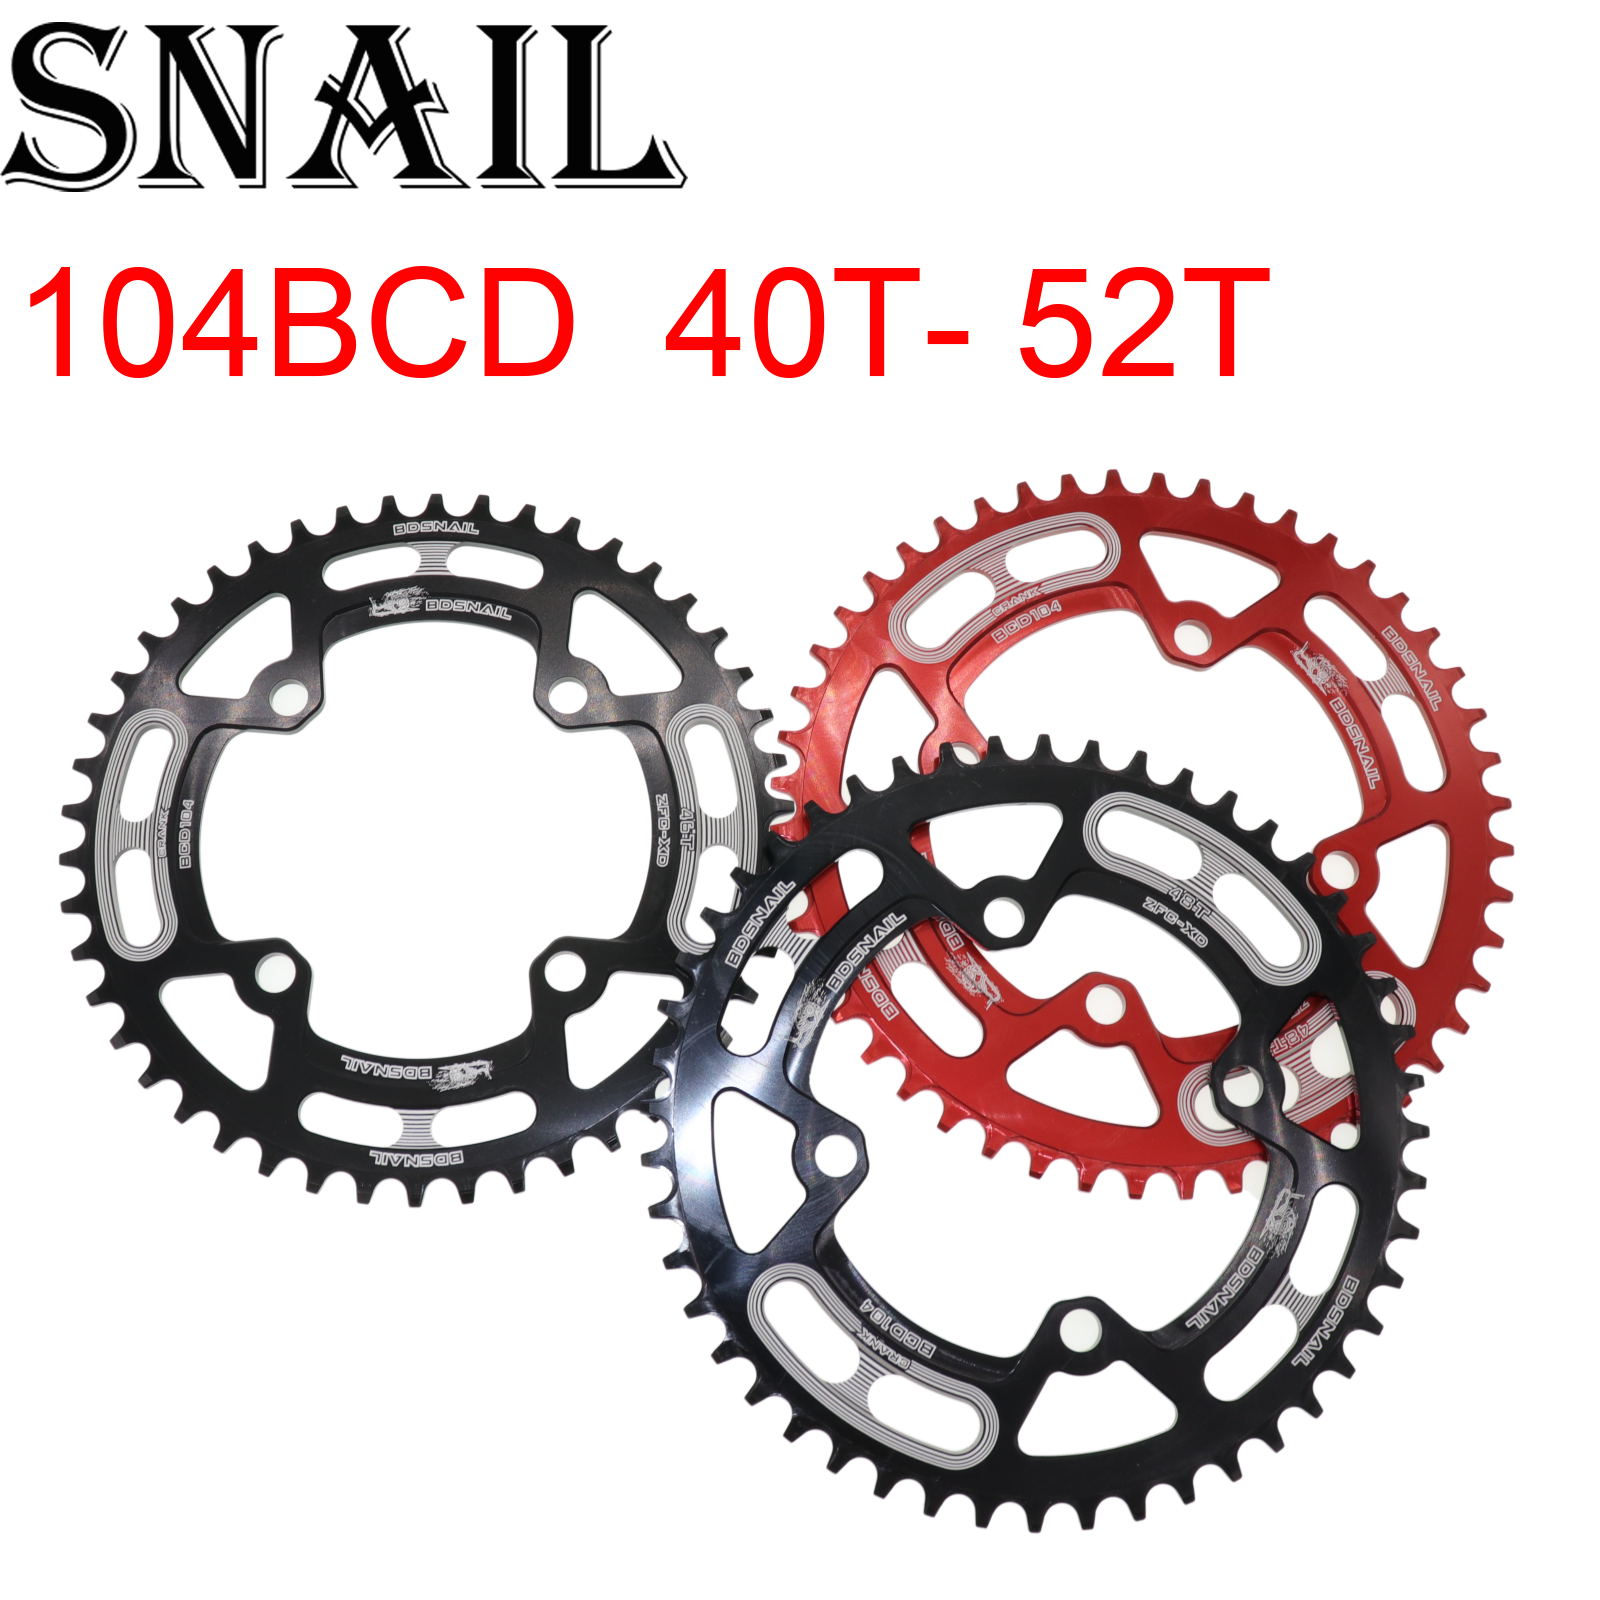 BDSNAIL 104BCD Crank Round Chainwheel MTB Road Bike Chainring Sprocket 44-52T